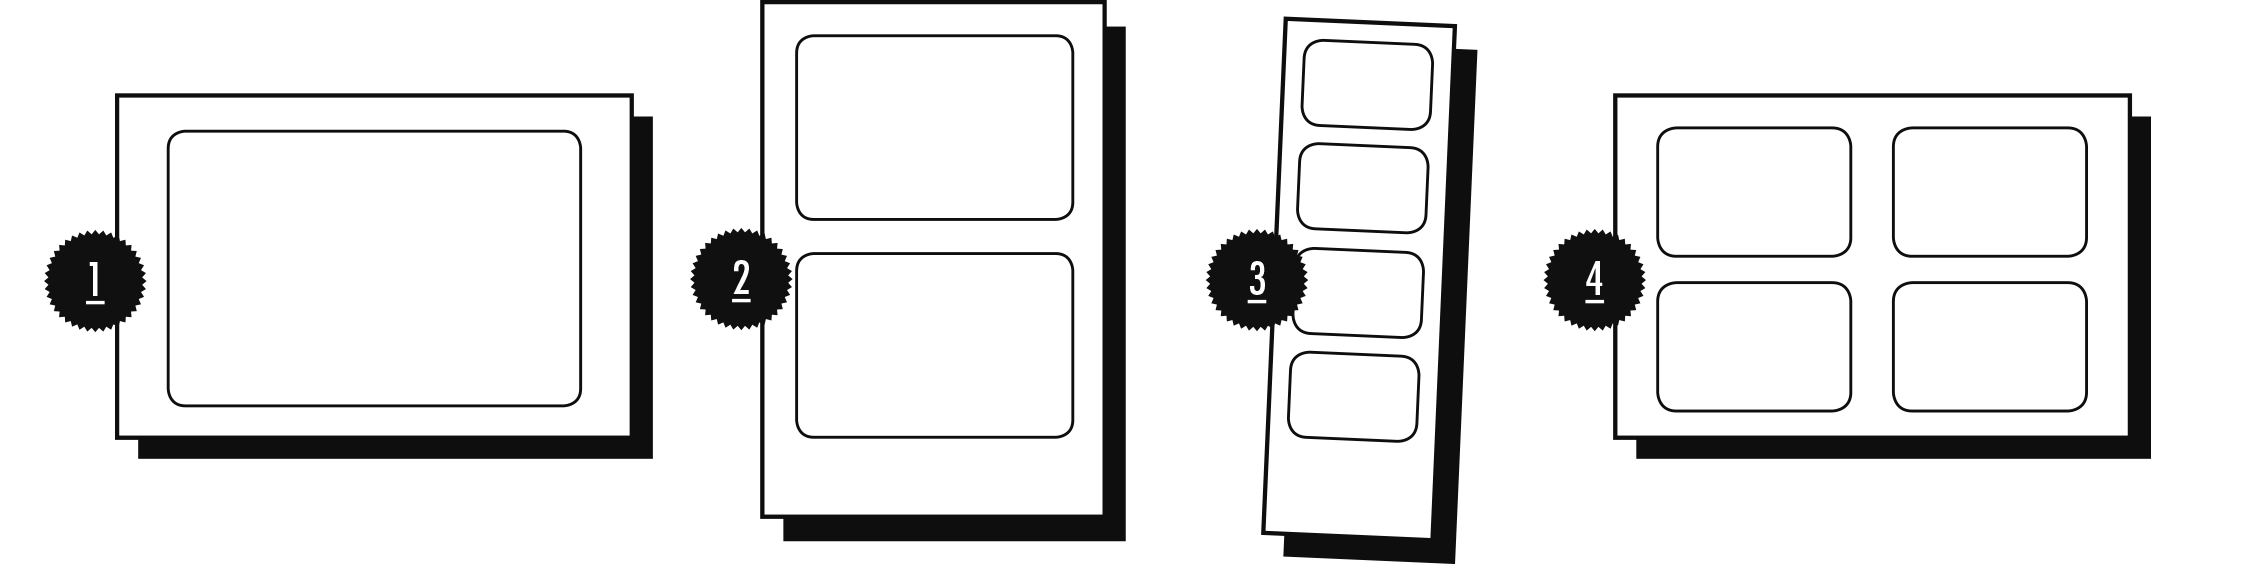 Photobooth huren - fotoprint layouts.png